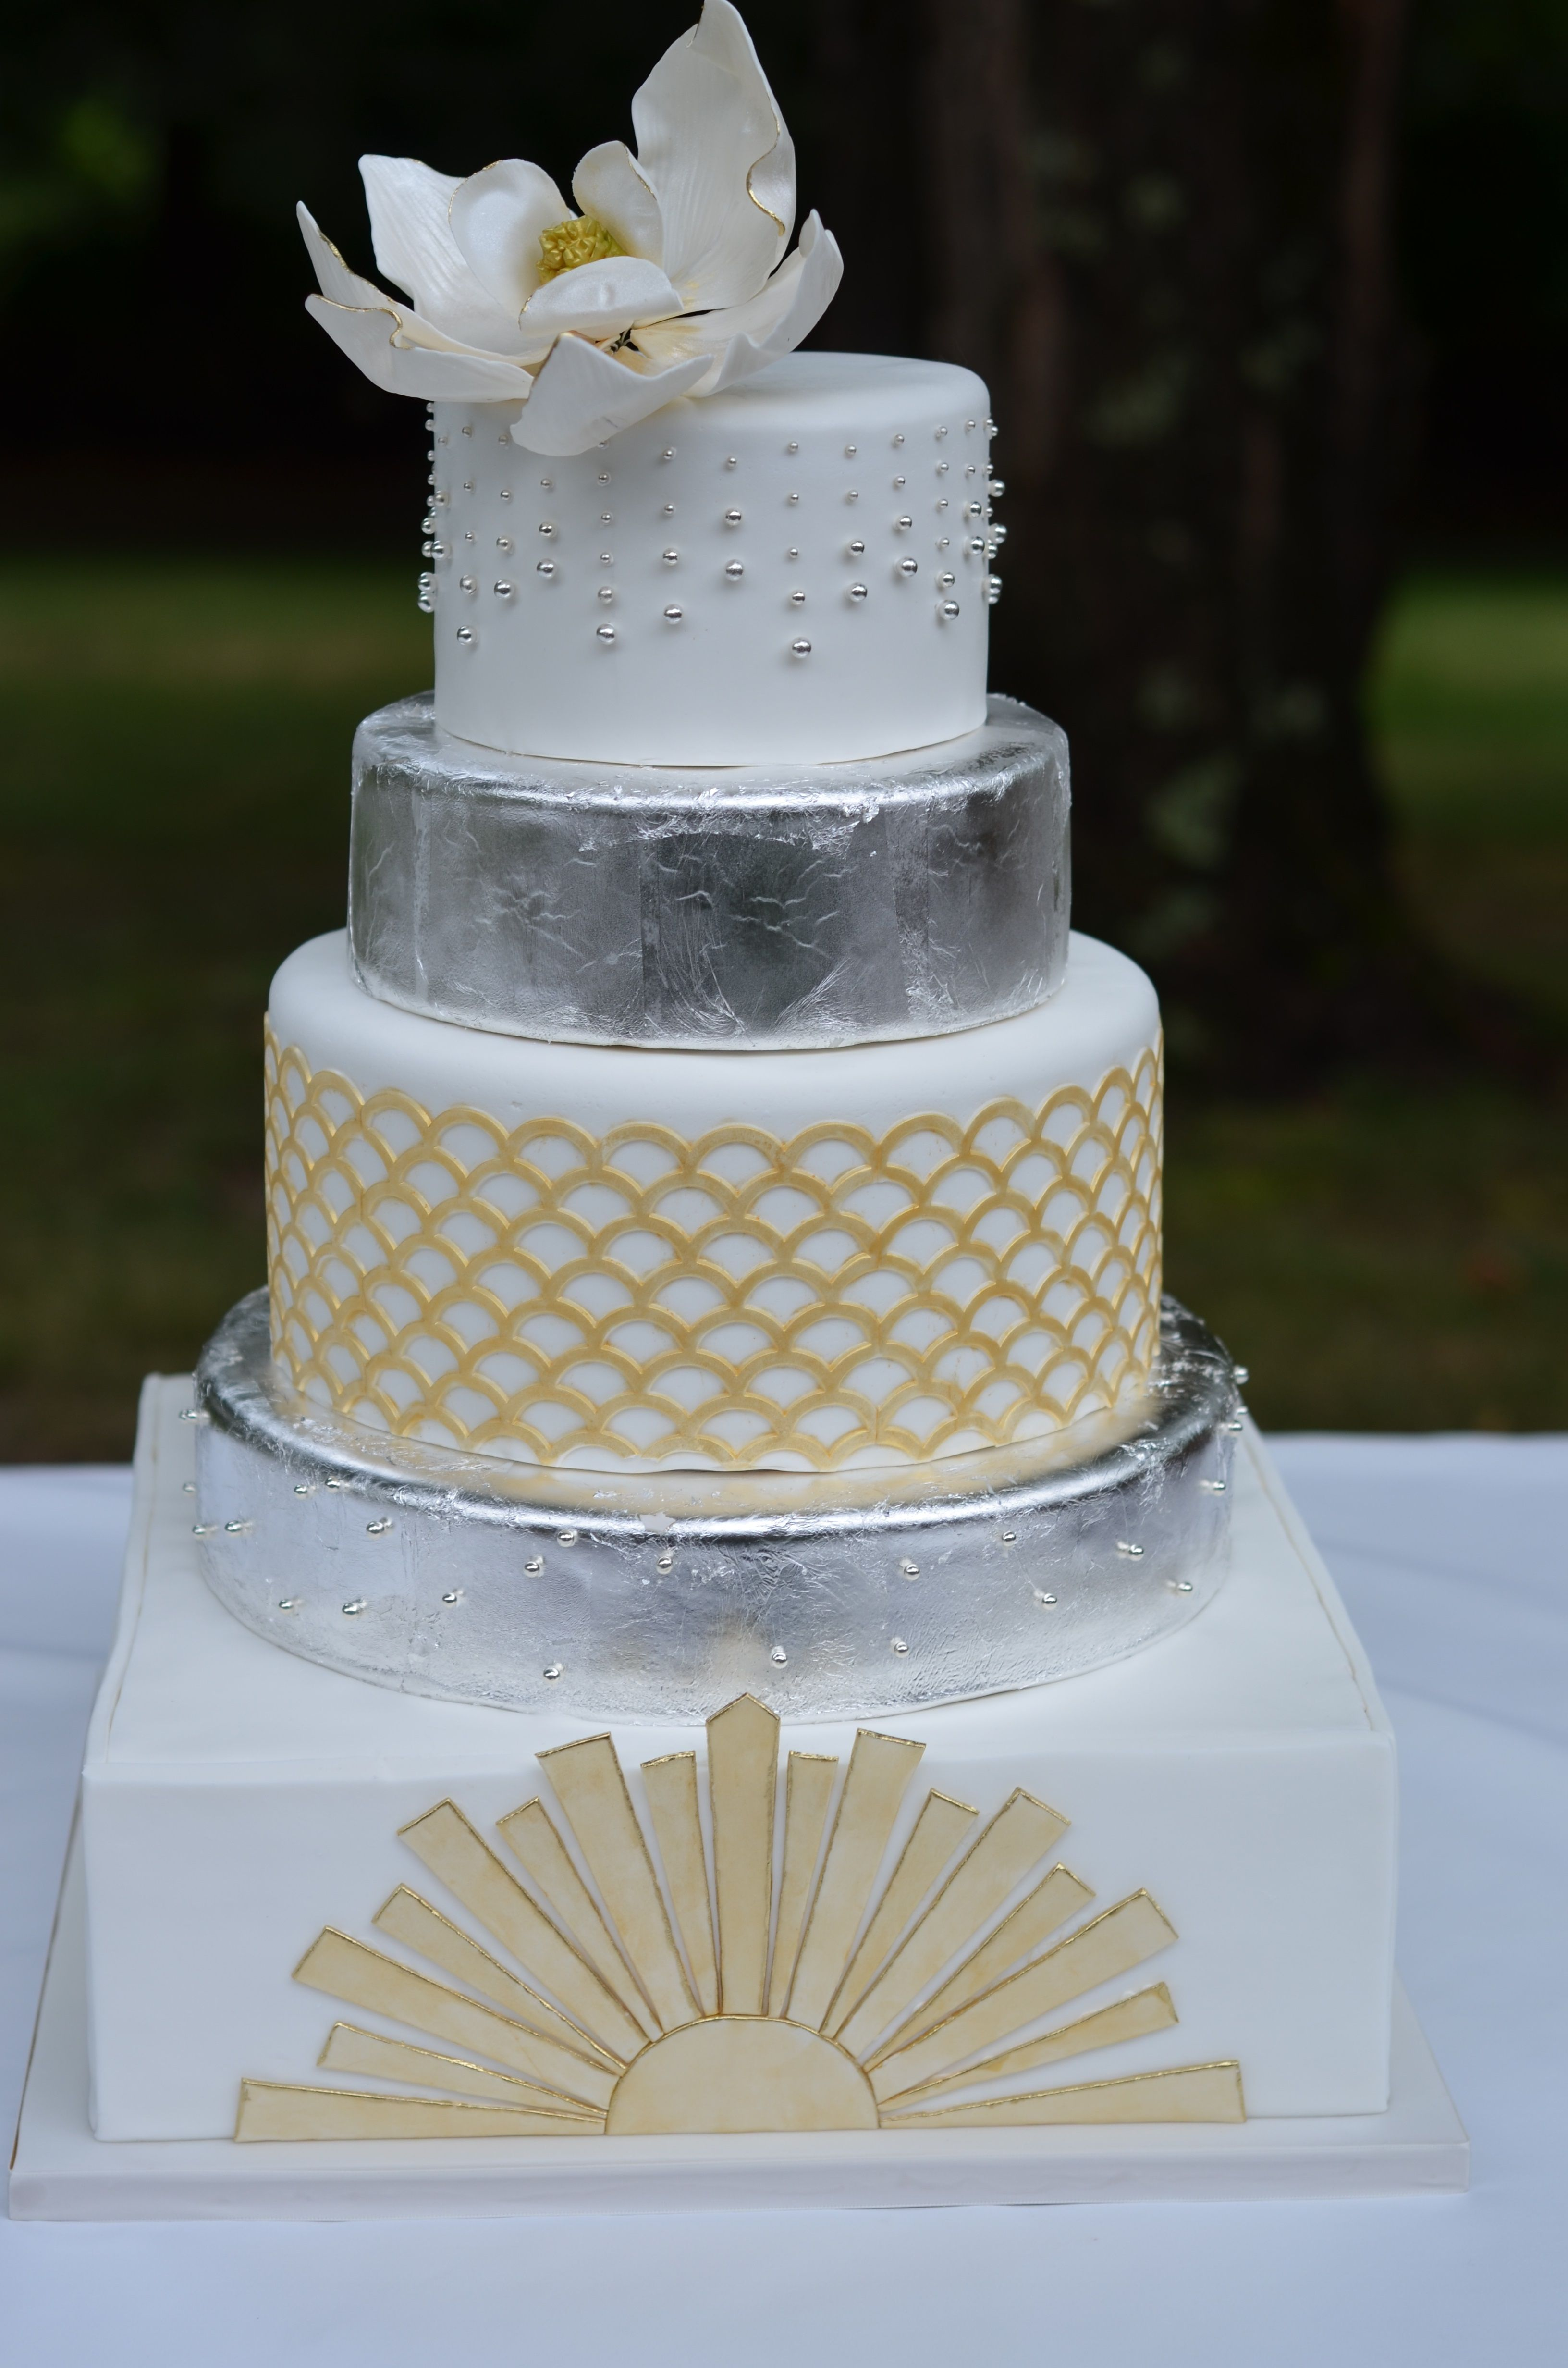 Round Wedding Cakes Great Gatsby wedding cake with sugar